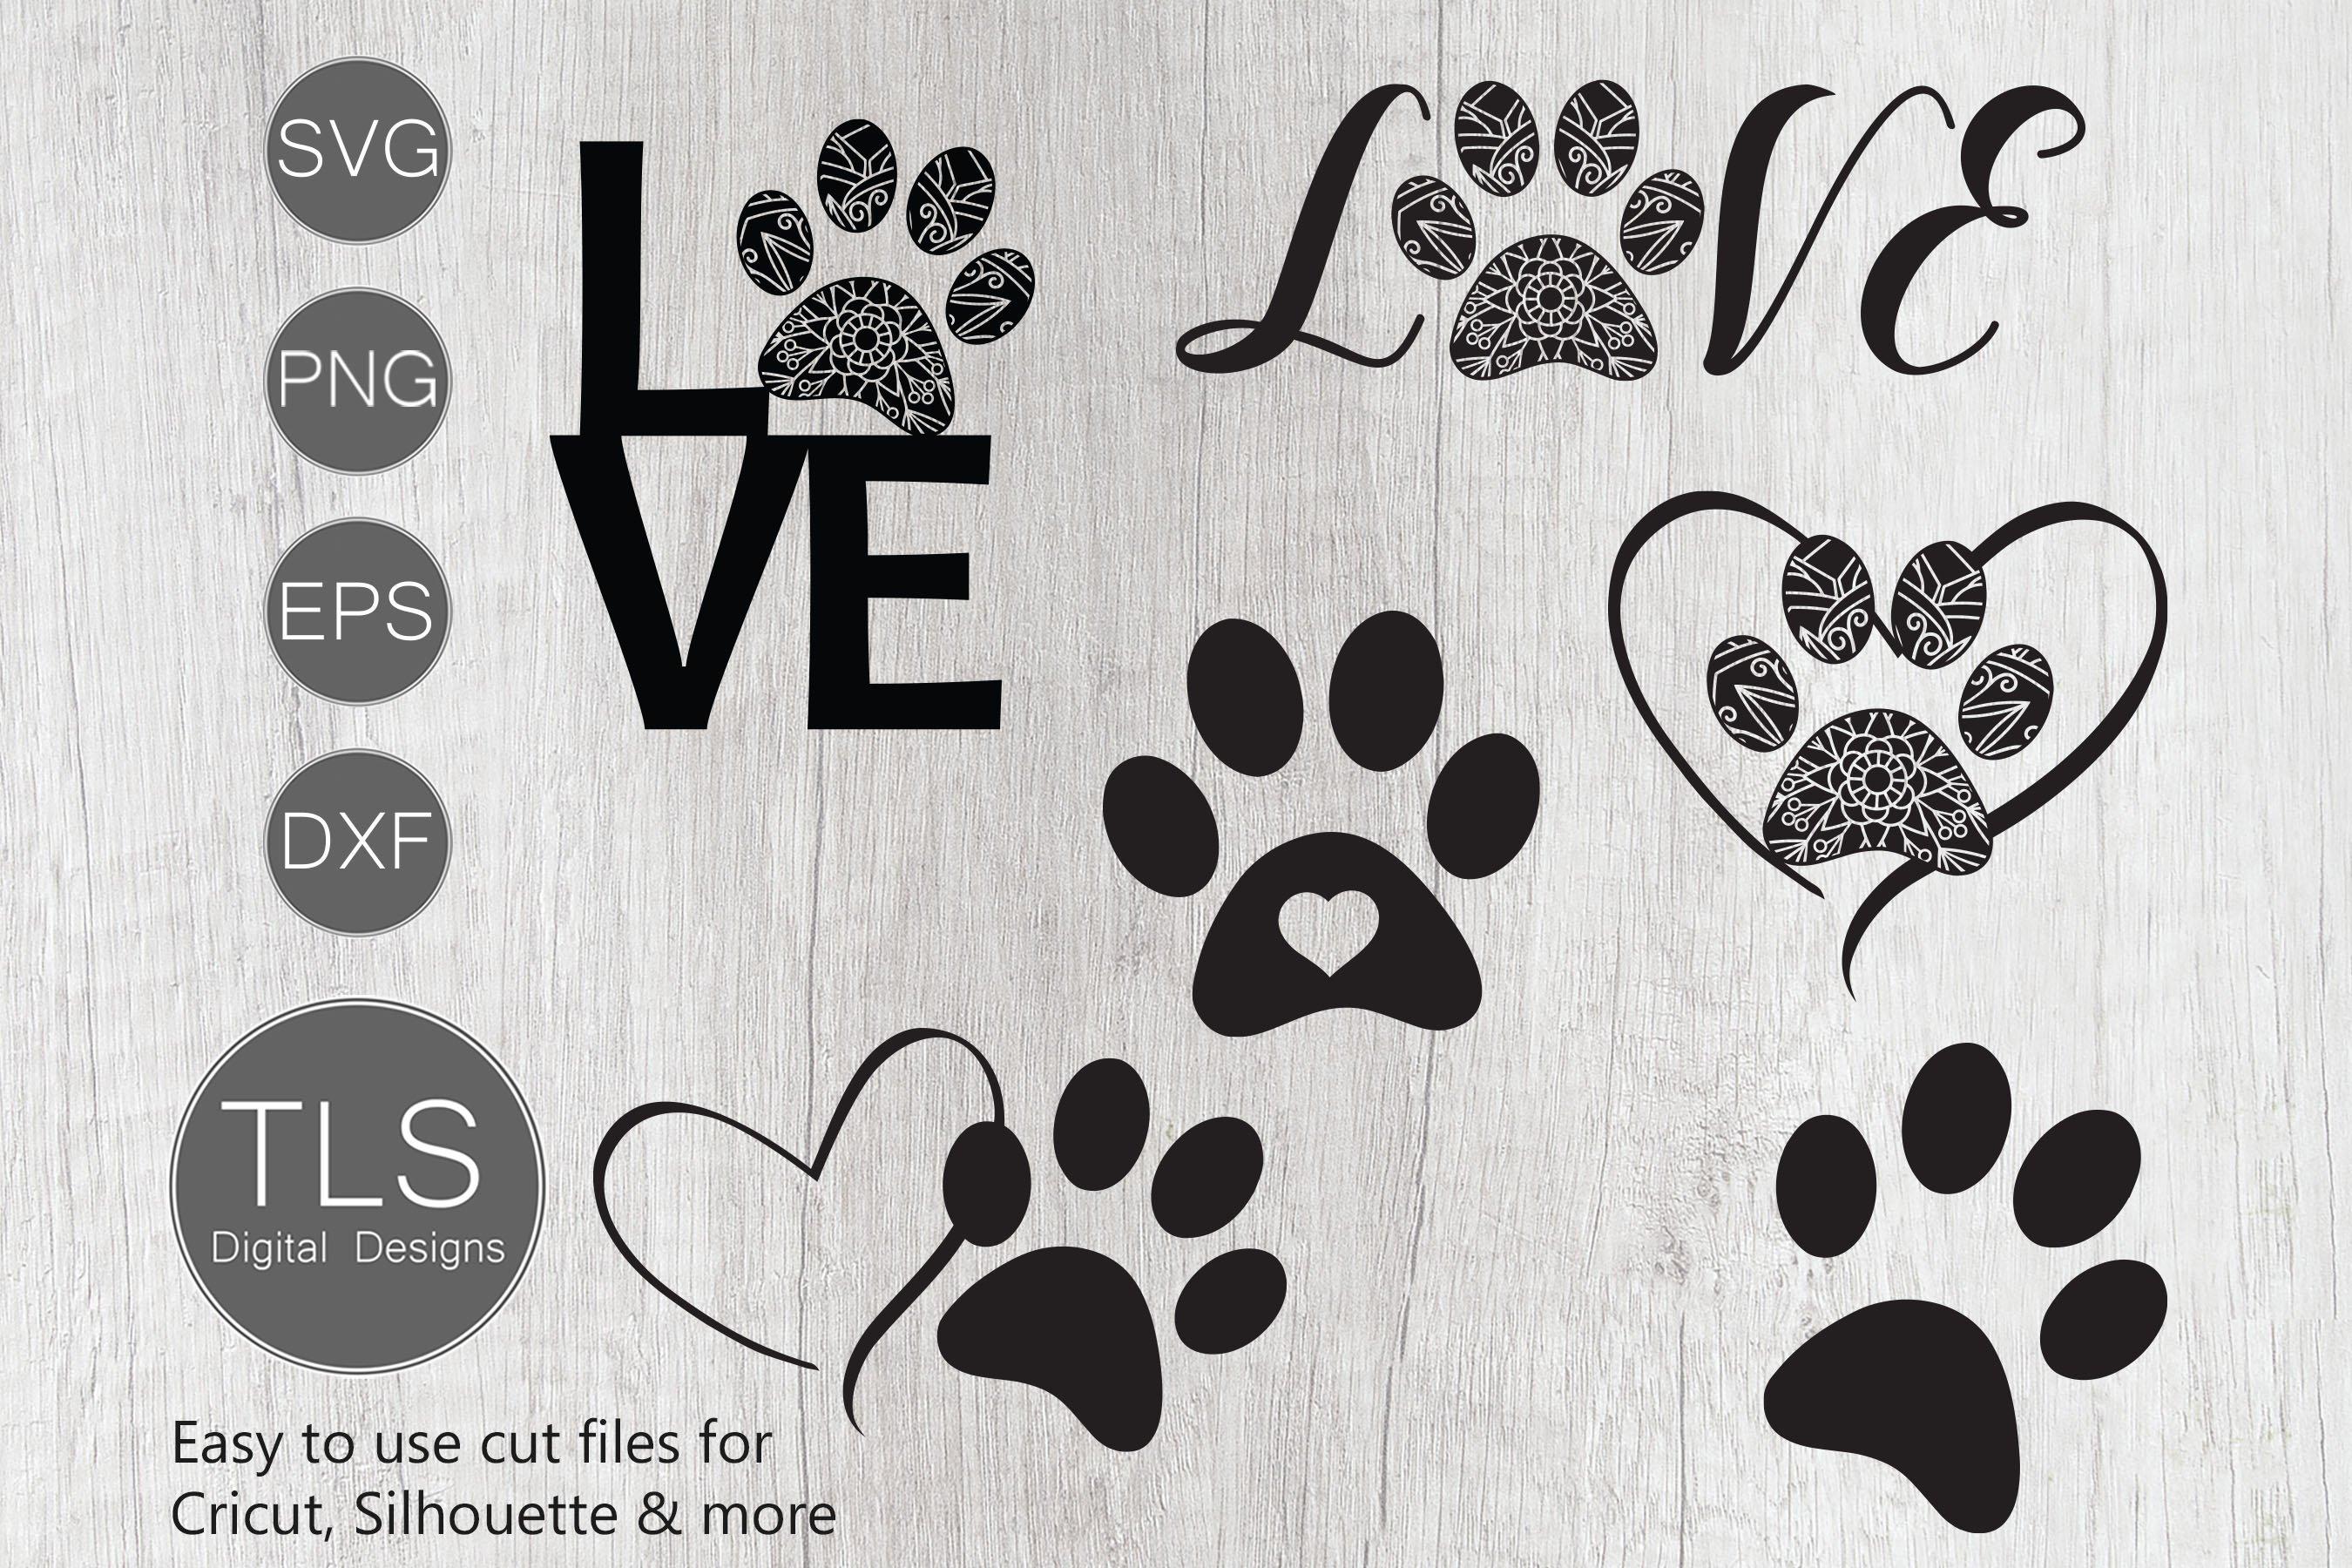 Polish Lowland Sheepdog SVG Bundle PNG Dog Design Pet Canine Logo Mascot Clipart Vector Cut Files Cricut Eps Dxf